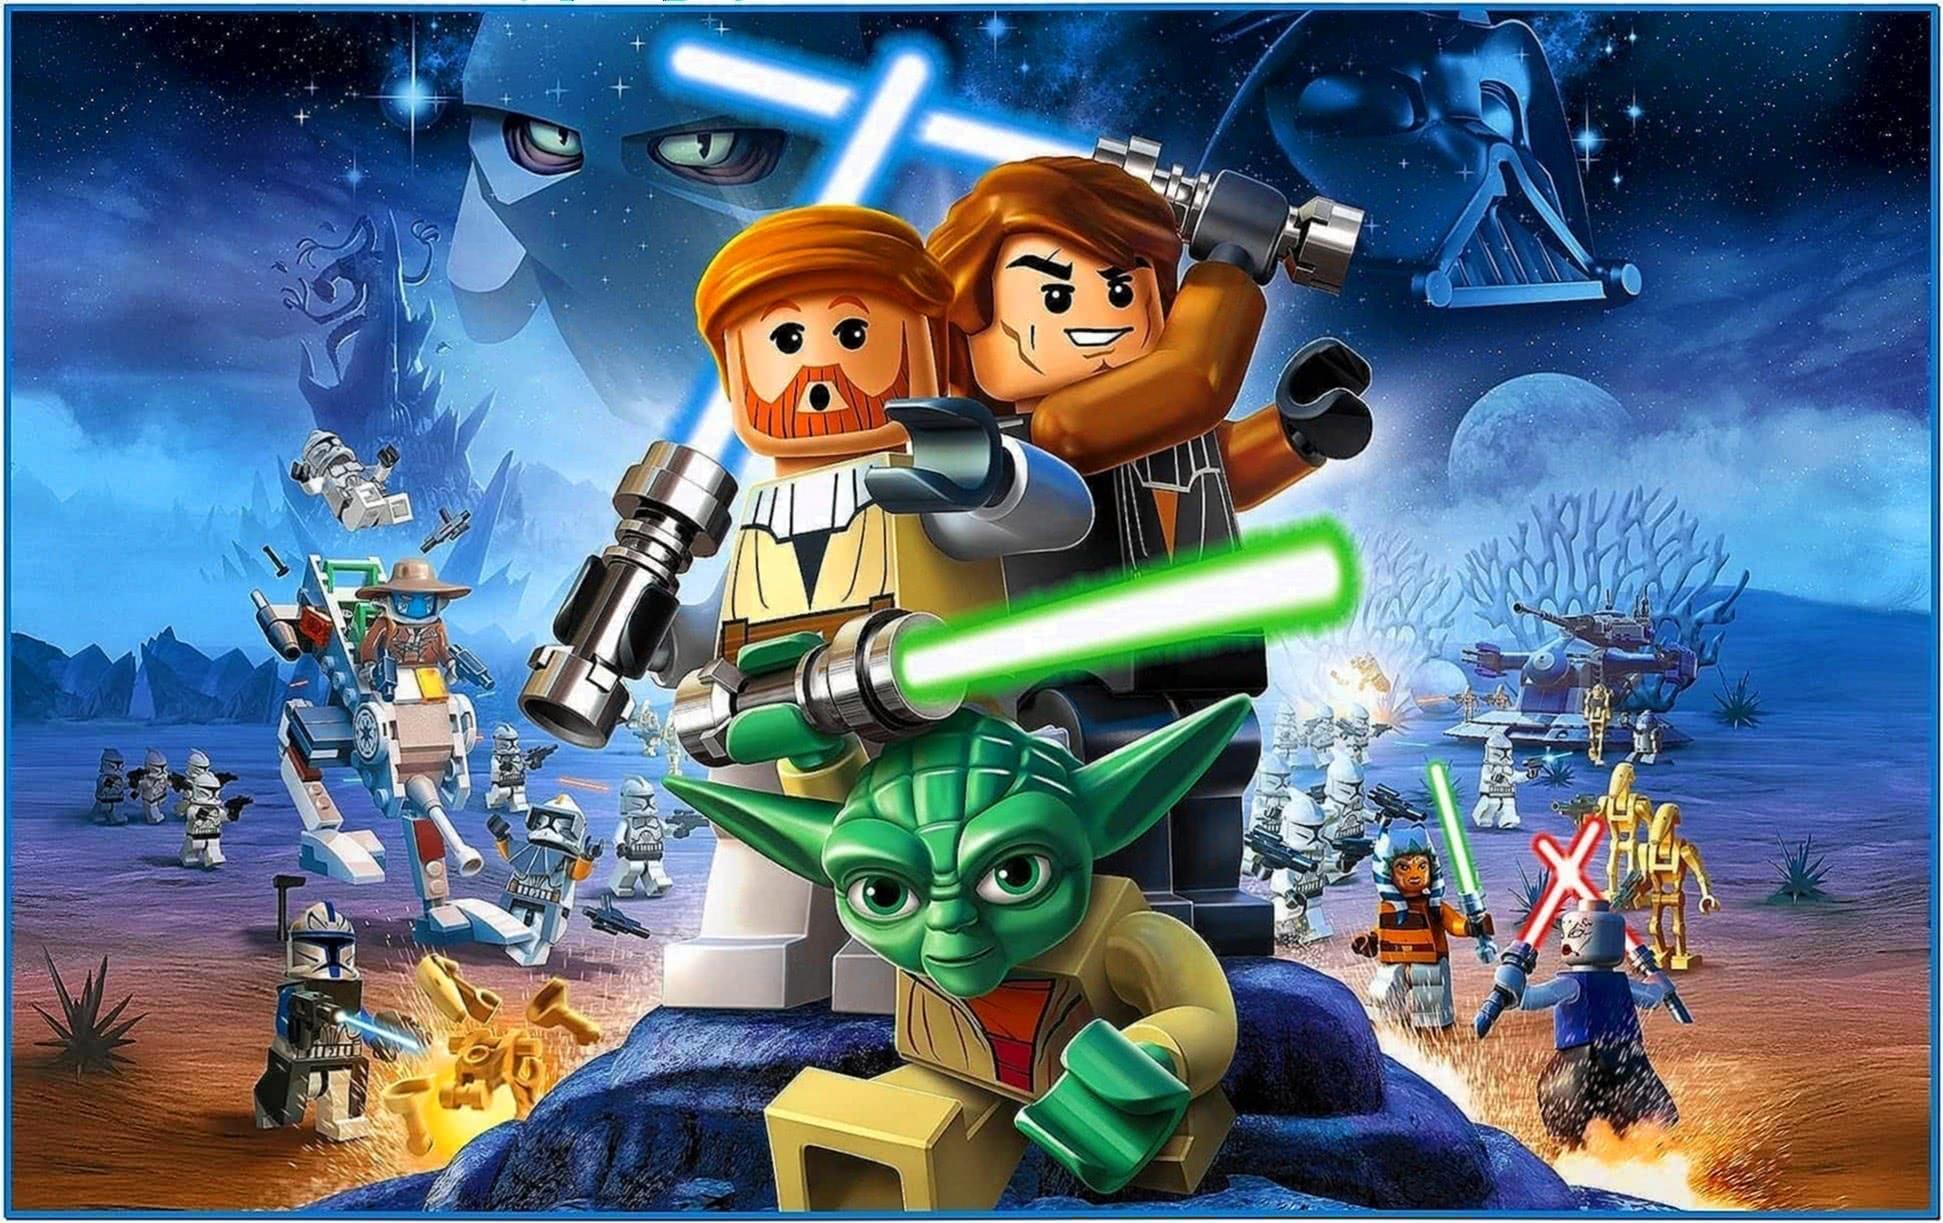 lego star wars screensaver  download free